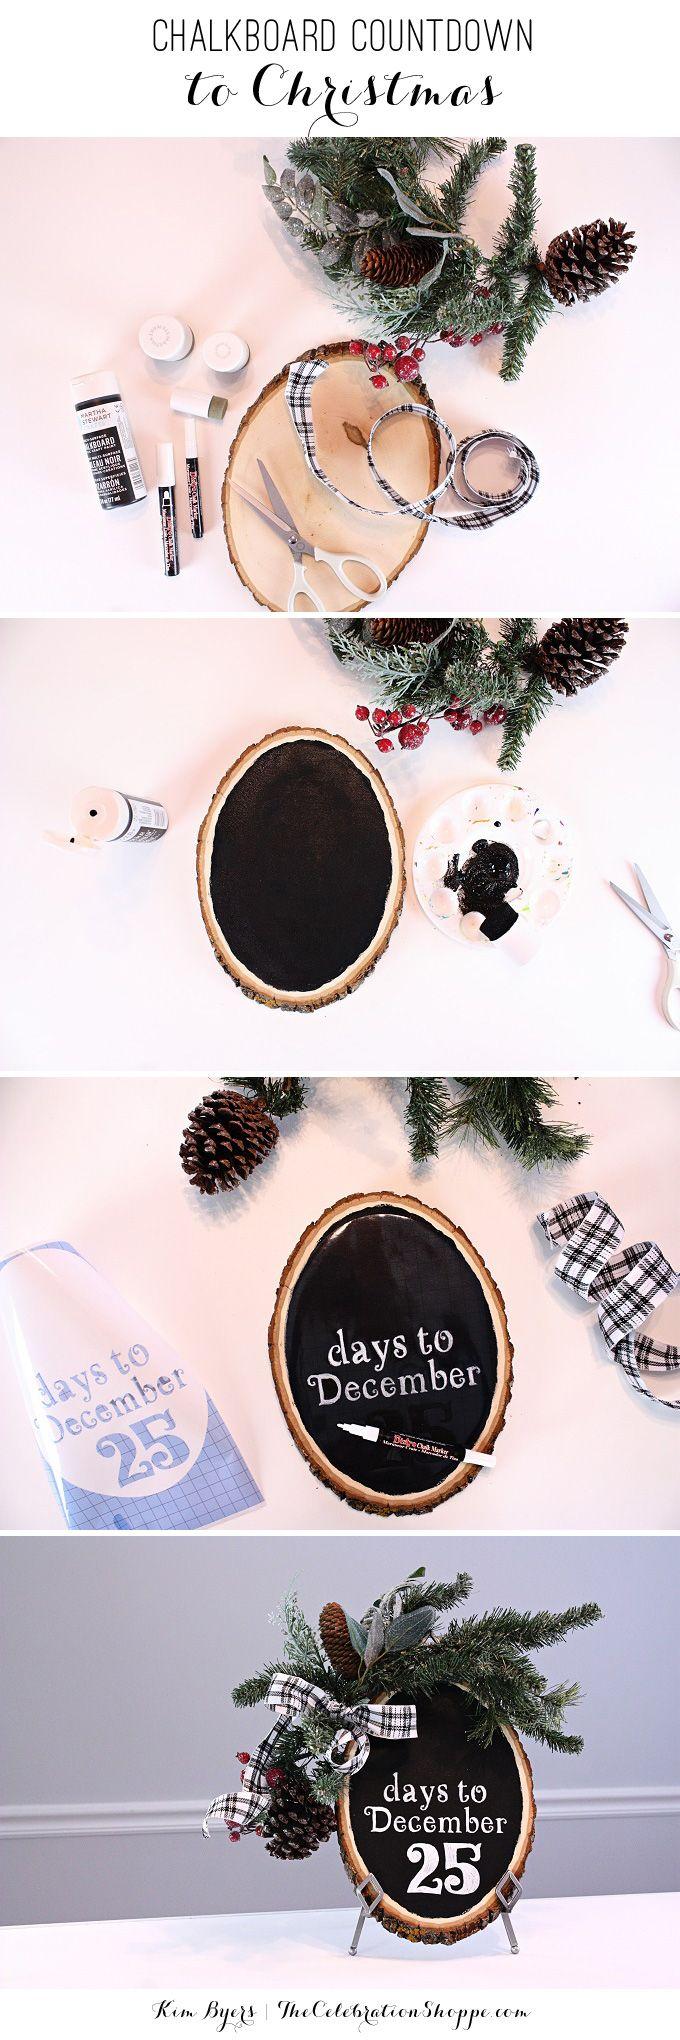 DIY Countdown To Christmas : Wood Slice Chalkboard Decoration and Display